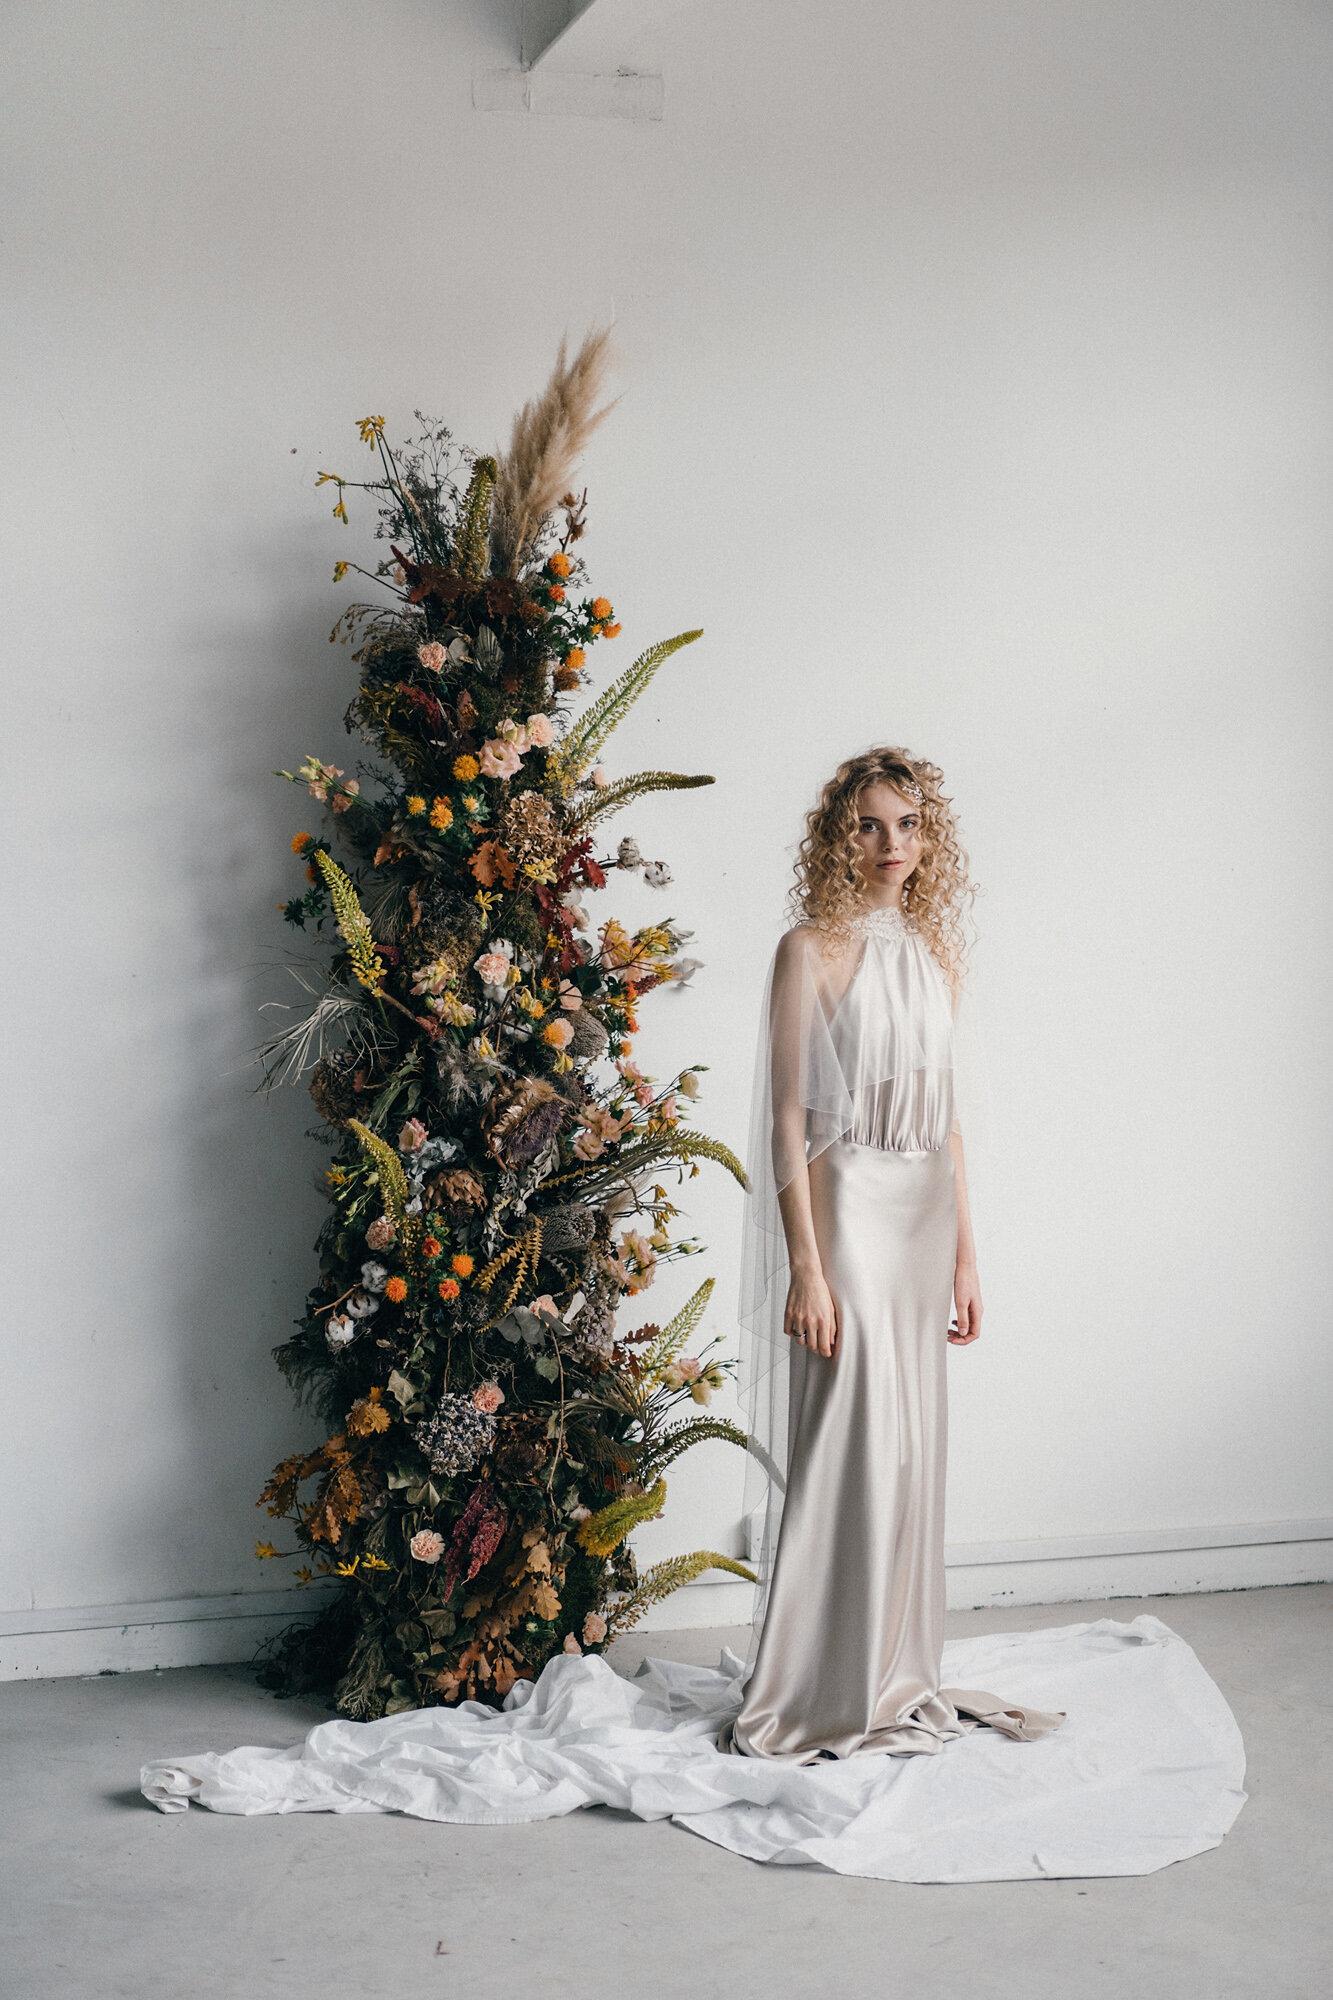 Debbie-Carlisle-Bridal-Accessories-Kate-Beaumont-Wedding-Gowns-Sheffield-Yorkshire-UK-13.jpg